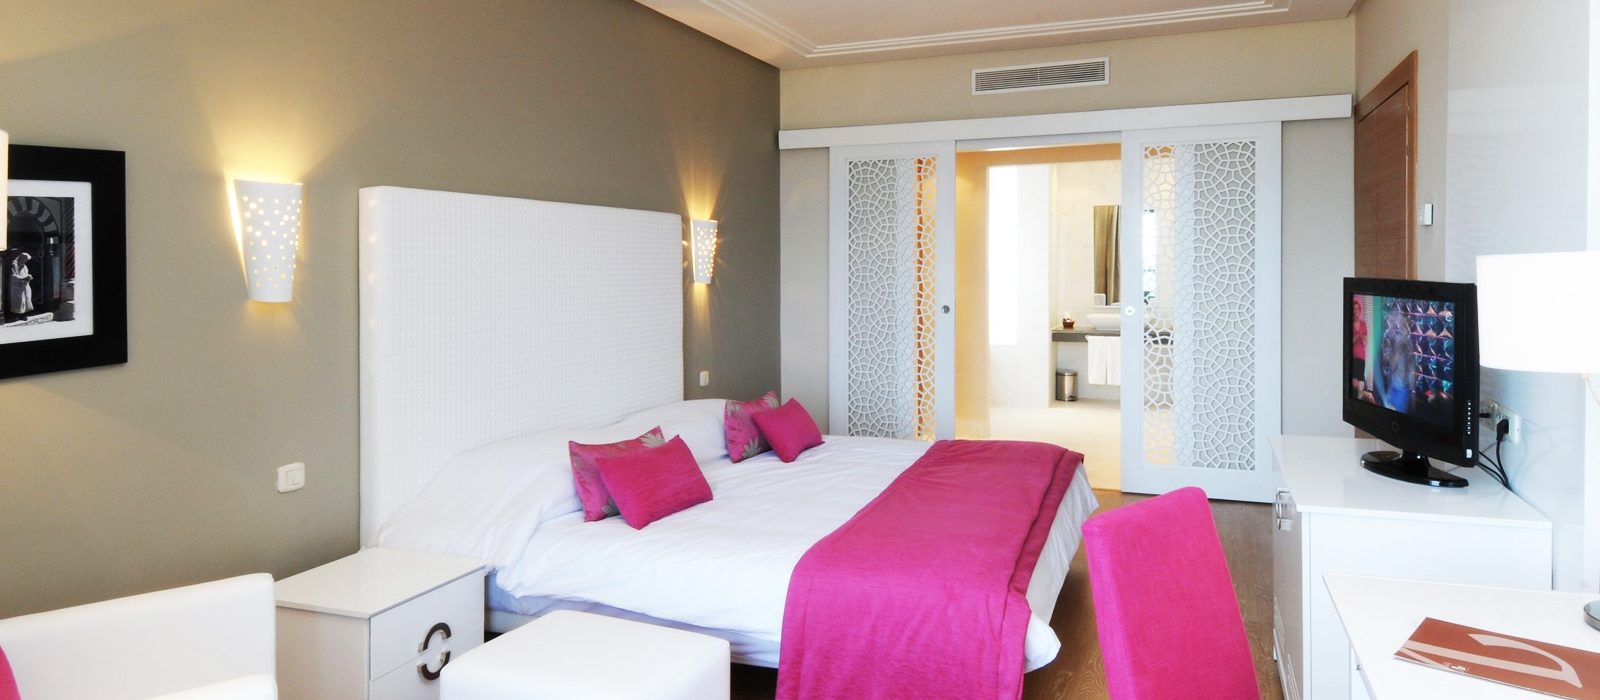 Rooms Hotel Vincci Hammamet Nozha Beach - Triple Room